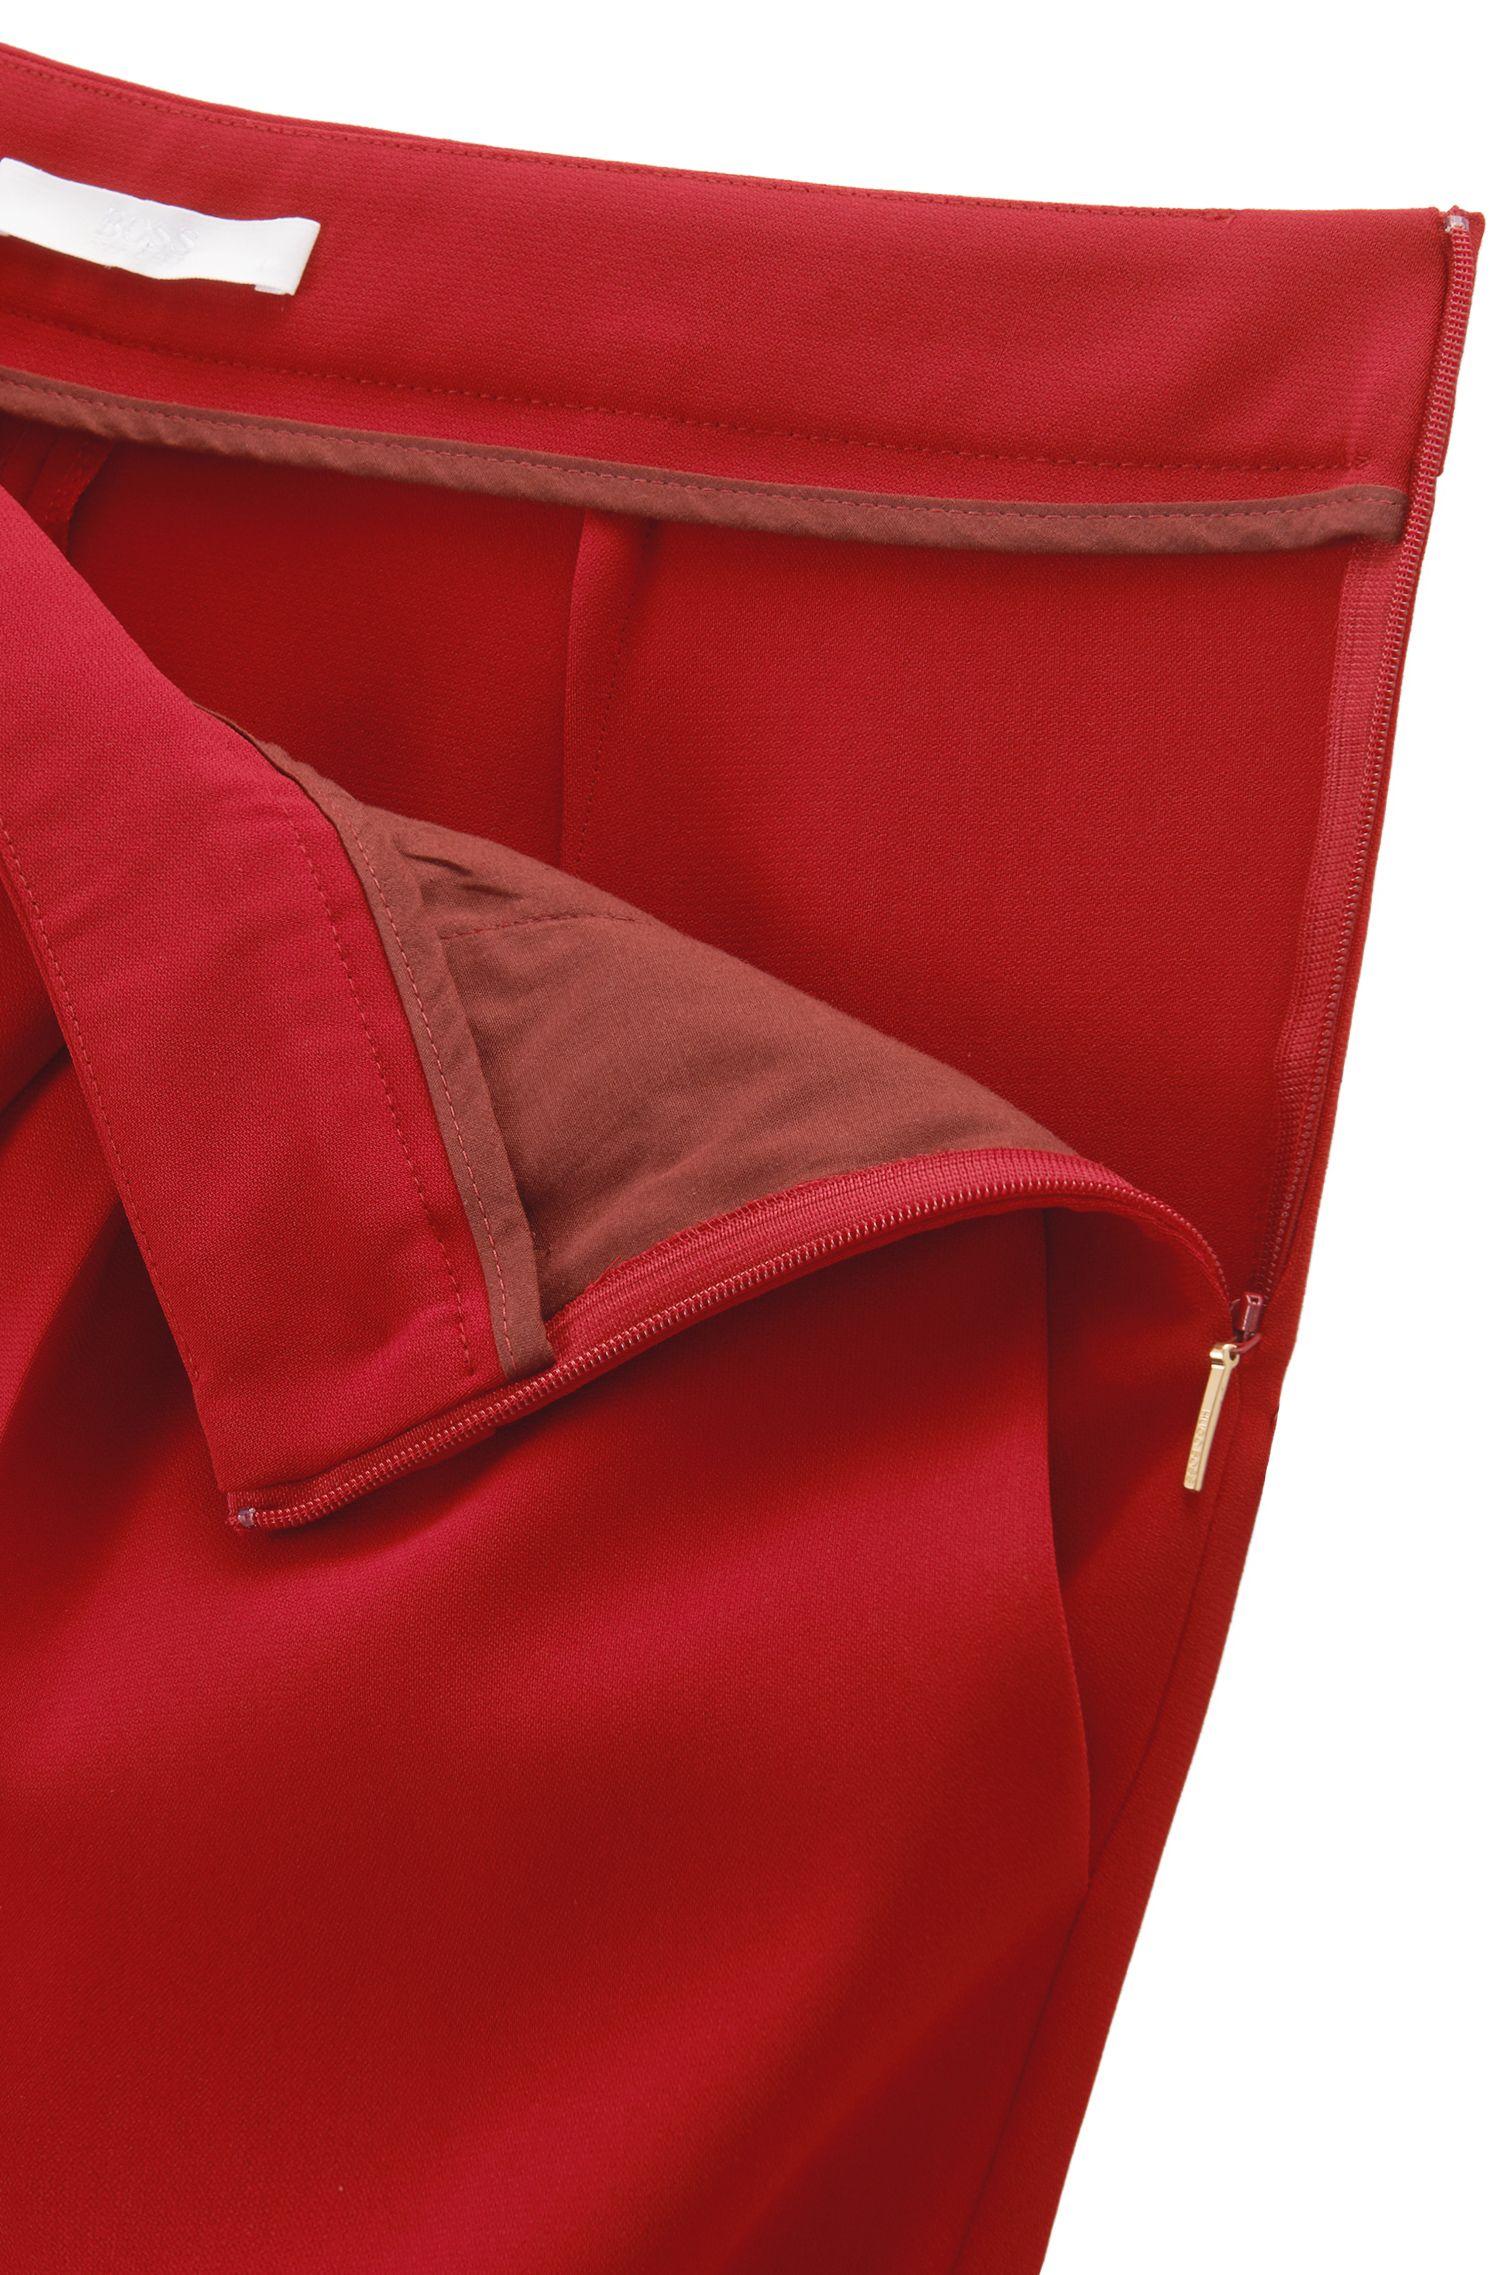 Kortere relaxed-fit broek met asymmetrisch plooidetail